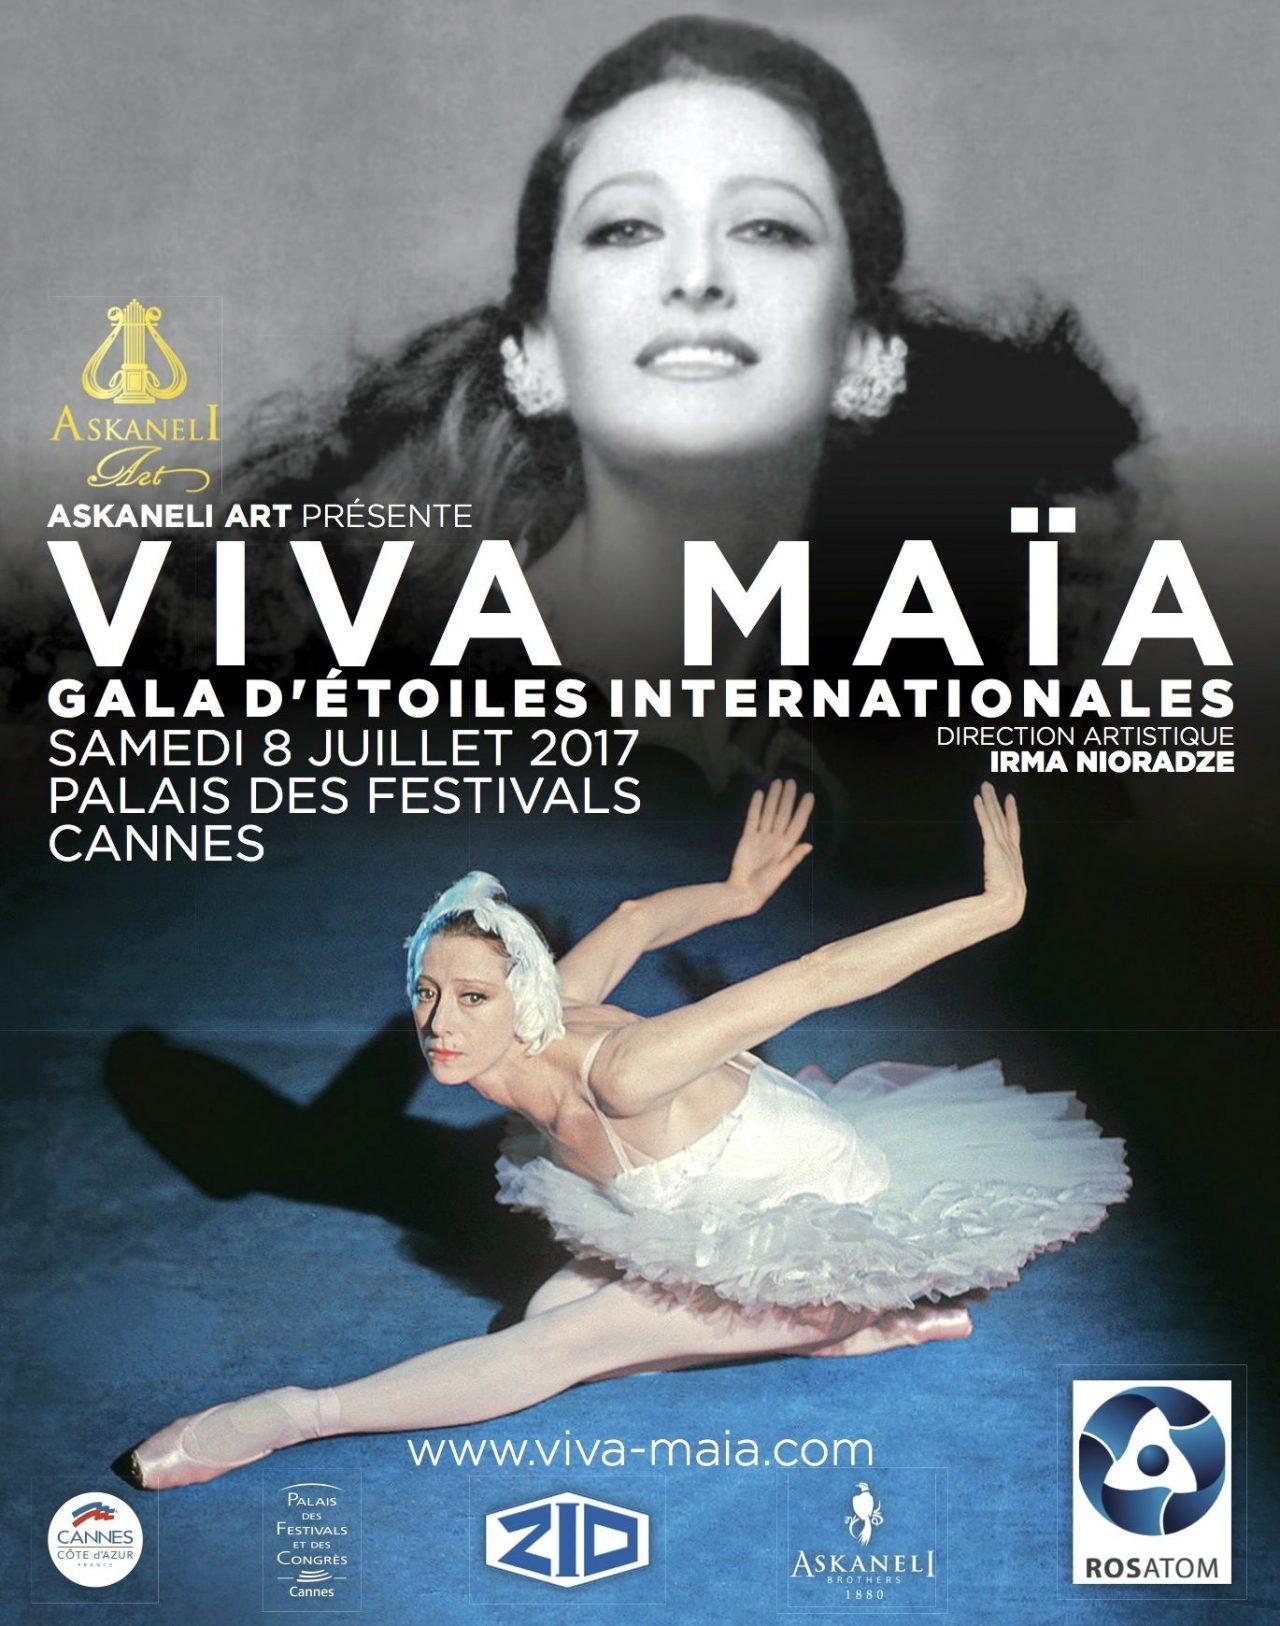 Irma-Balet-VIVA-MAIA-1280x1626.jpg